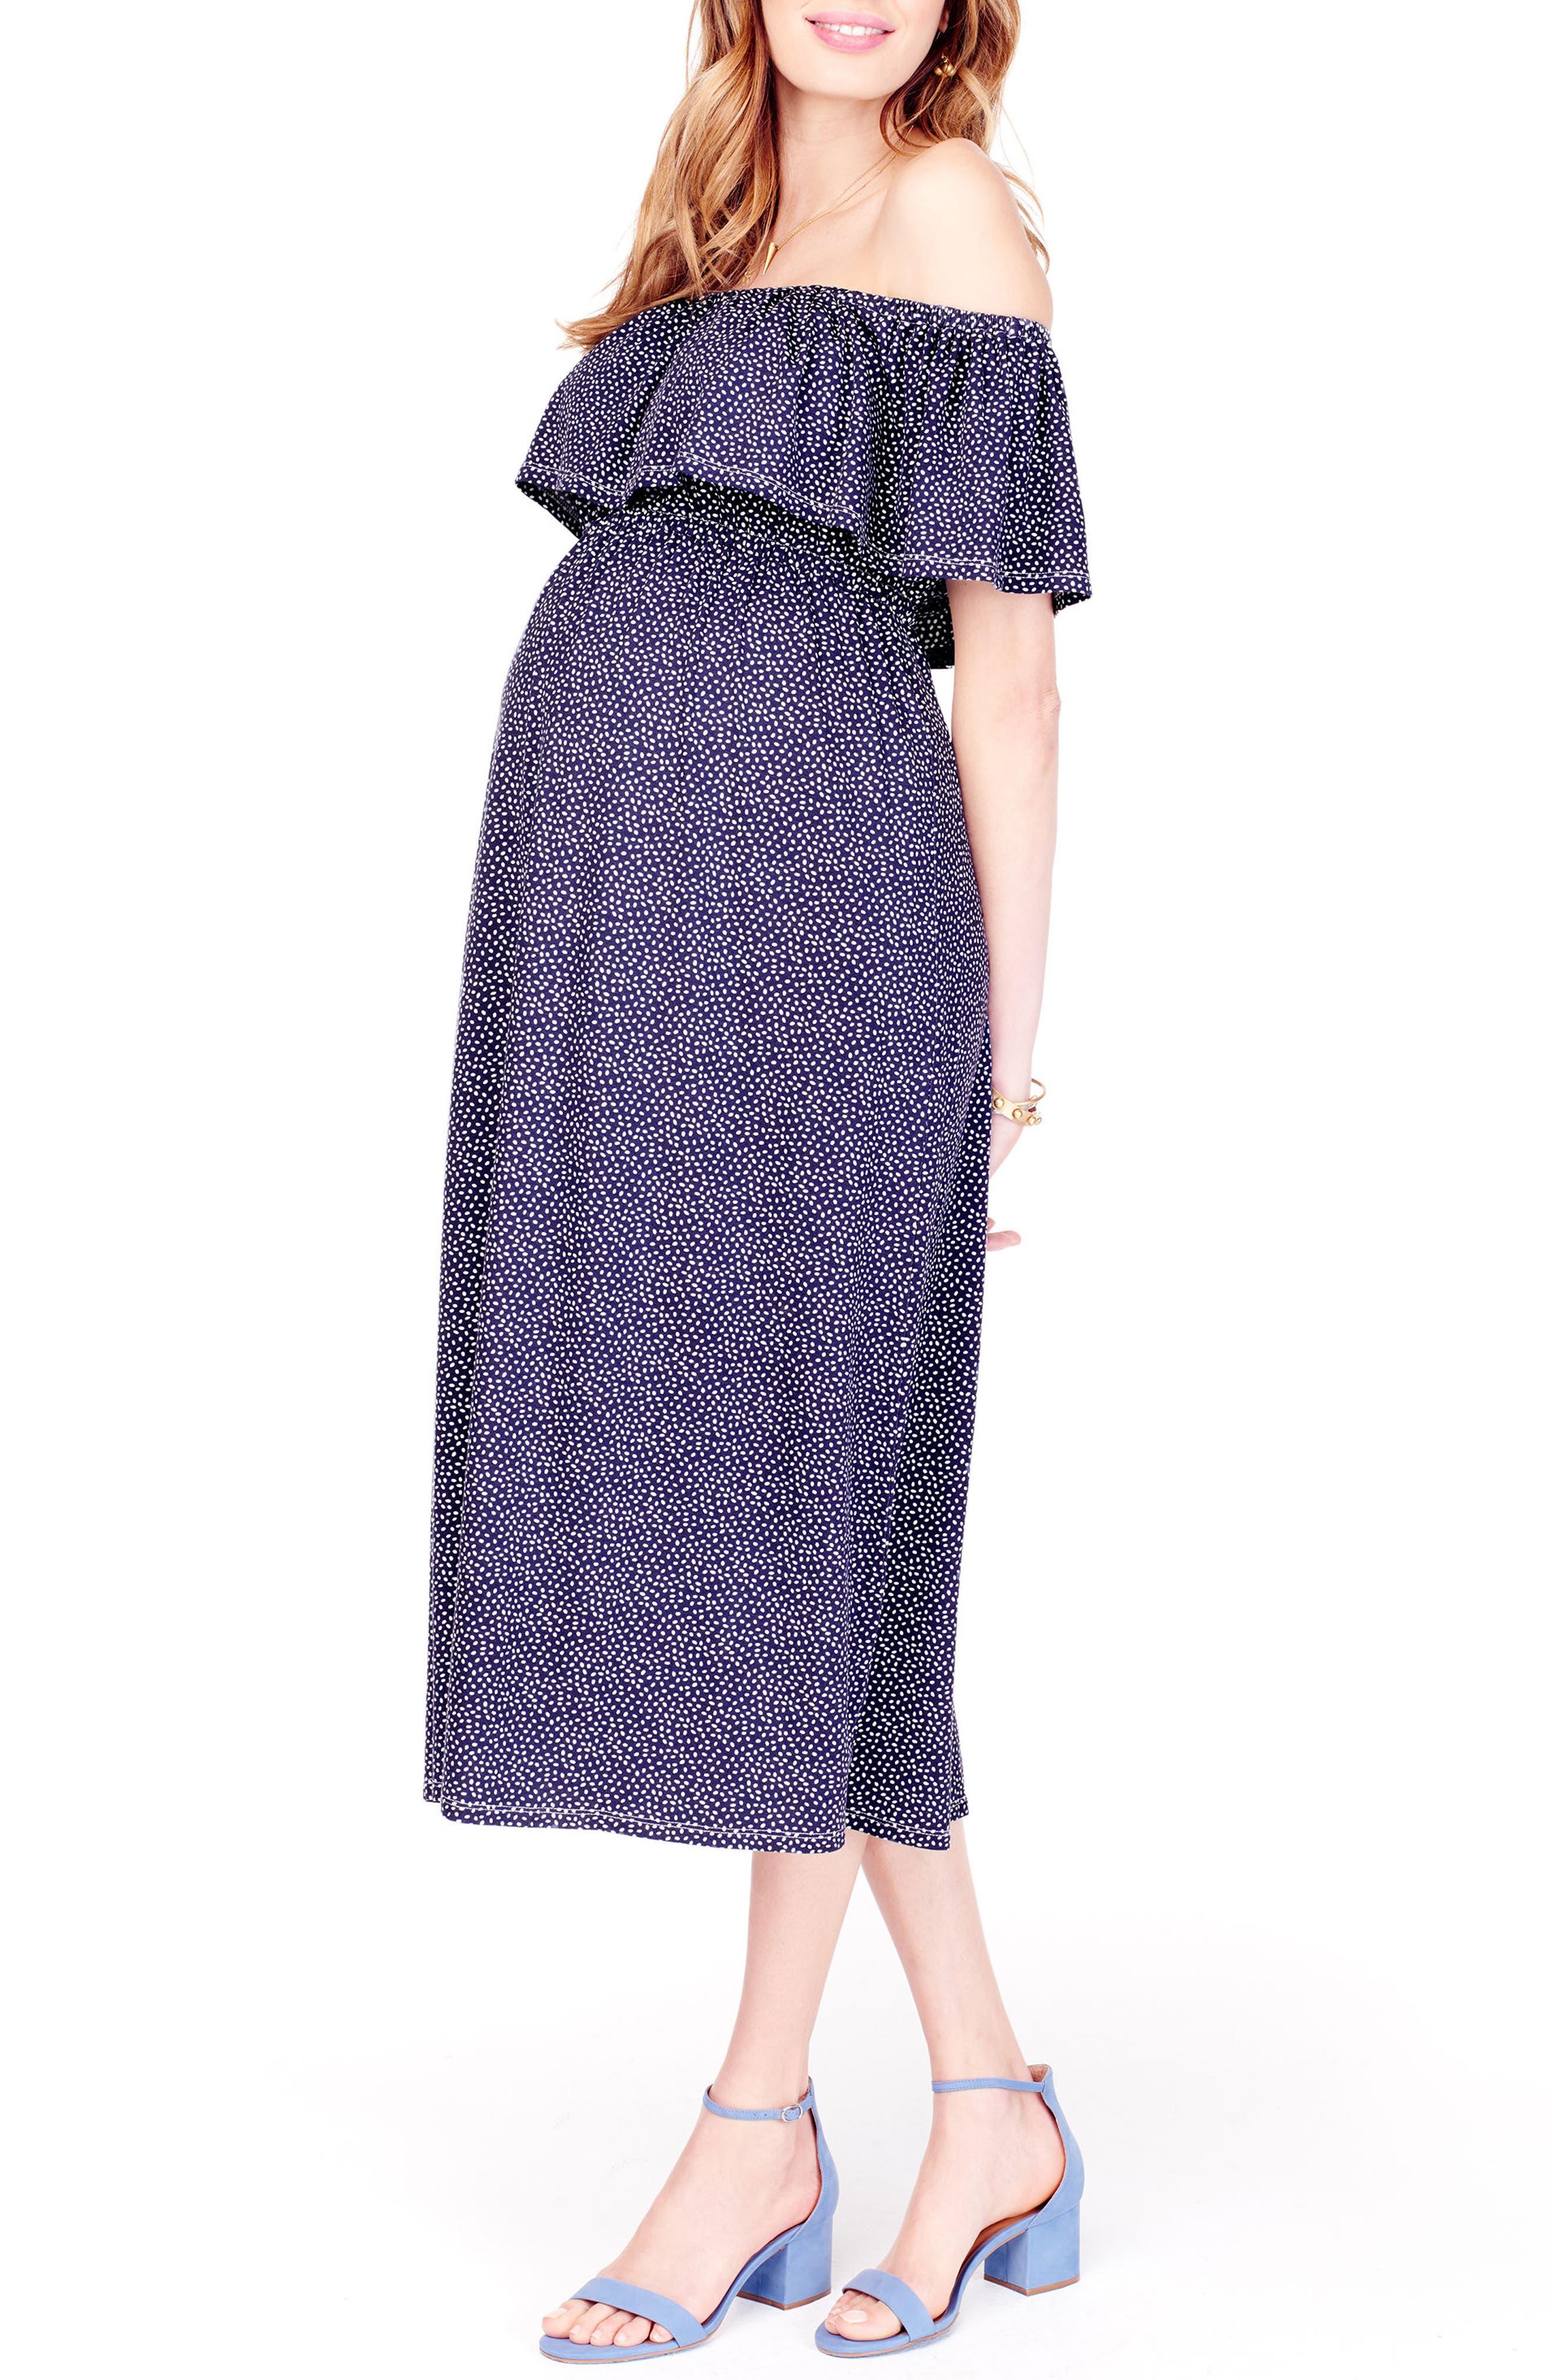 Off the Shoulder Maternity Midi Dress,                             Alternate thumbnail 4, color,                             Navy Tossed Petal